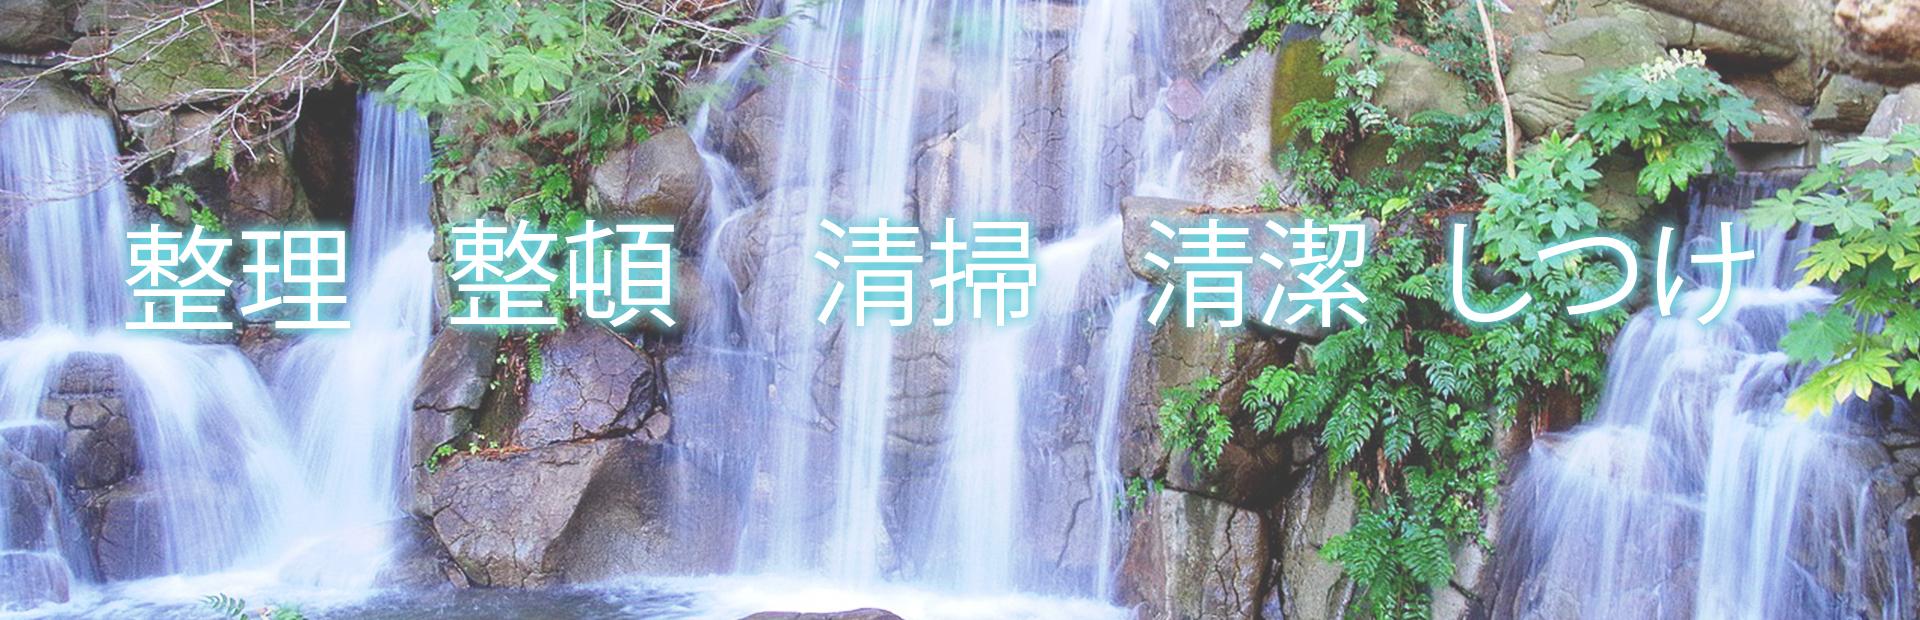 Natural waterfall, green plants and japanese phrasing